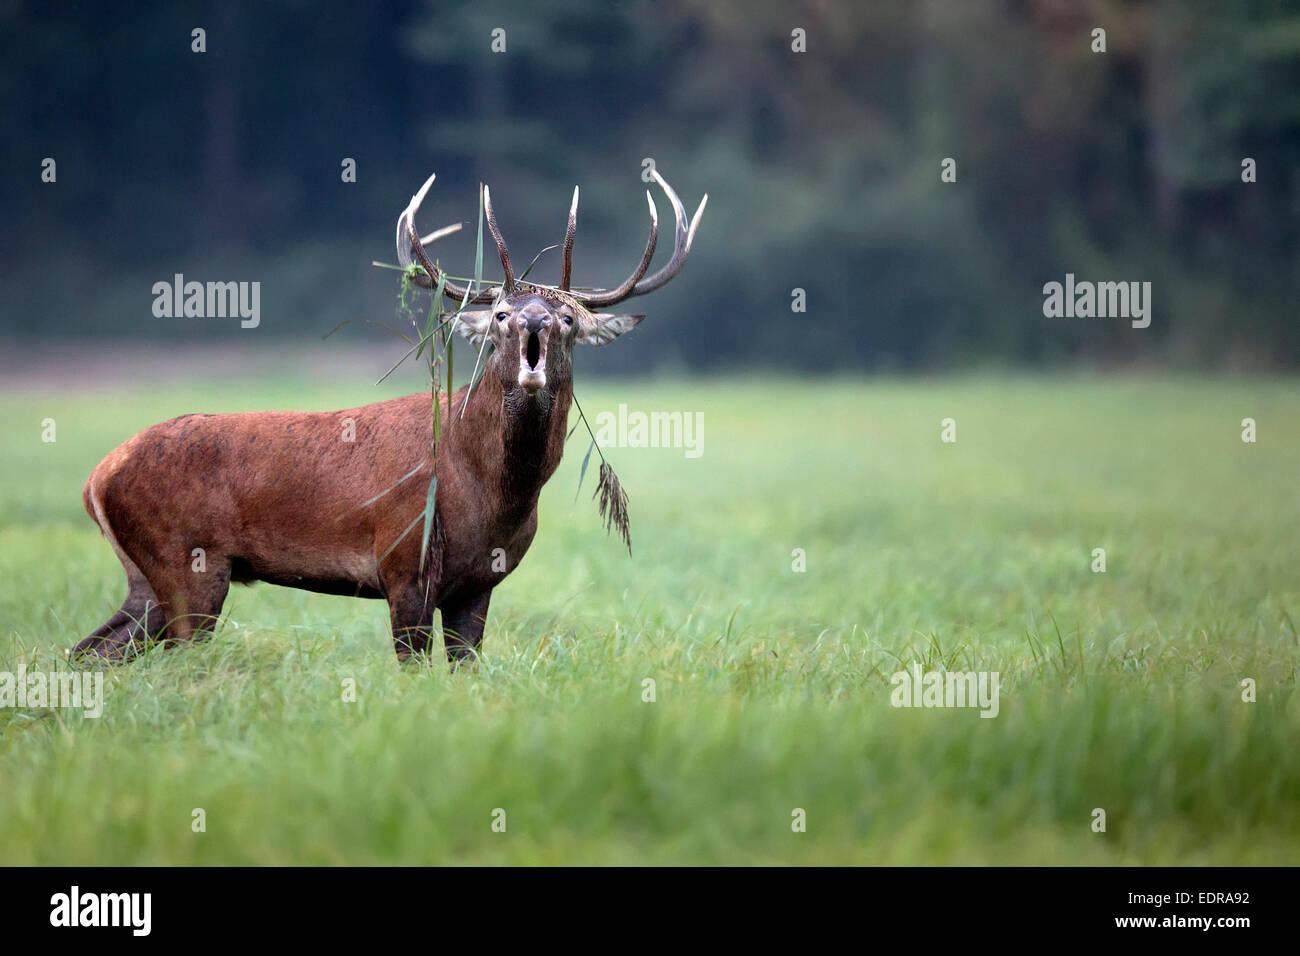 Red deer bellowing in the wild - Stock Image